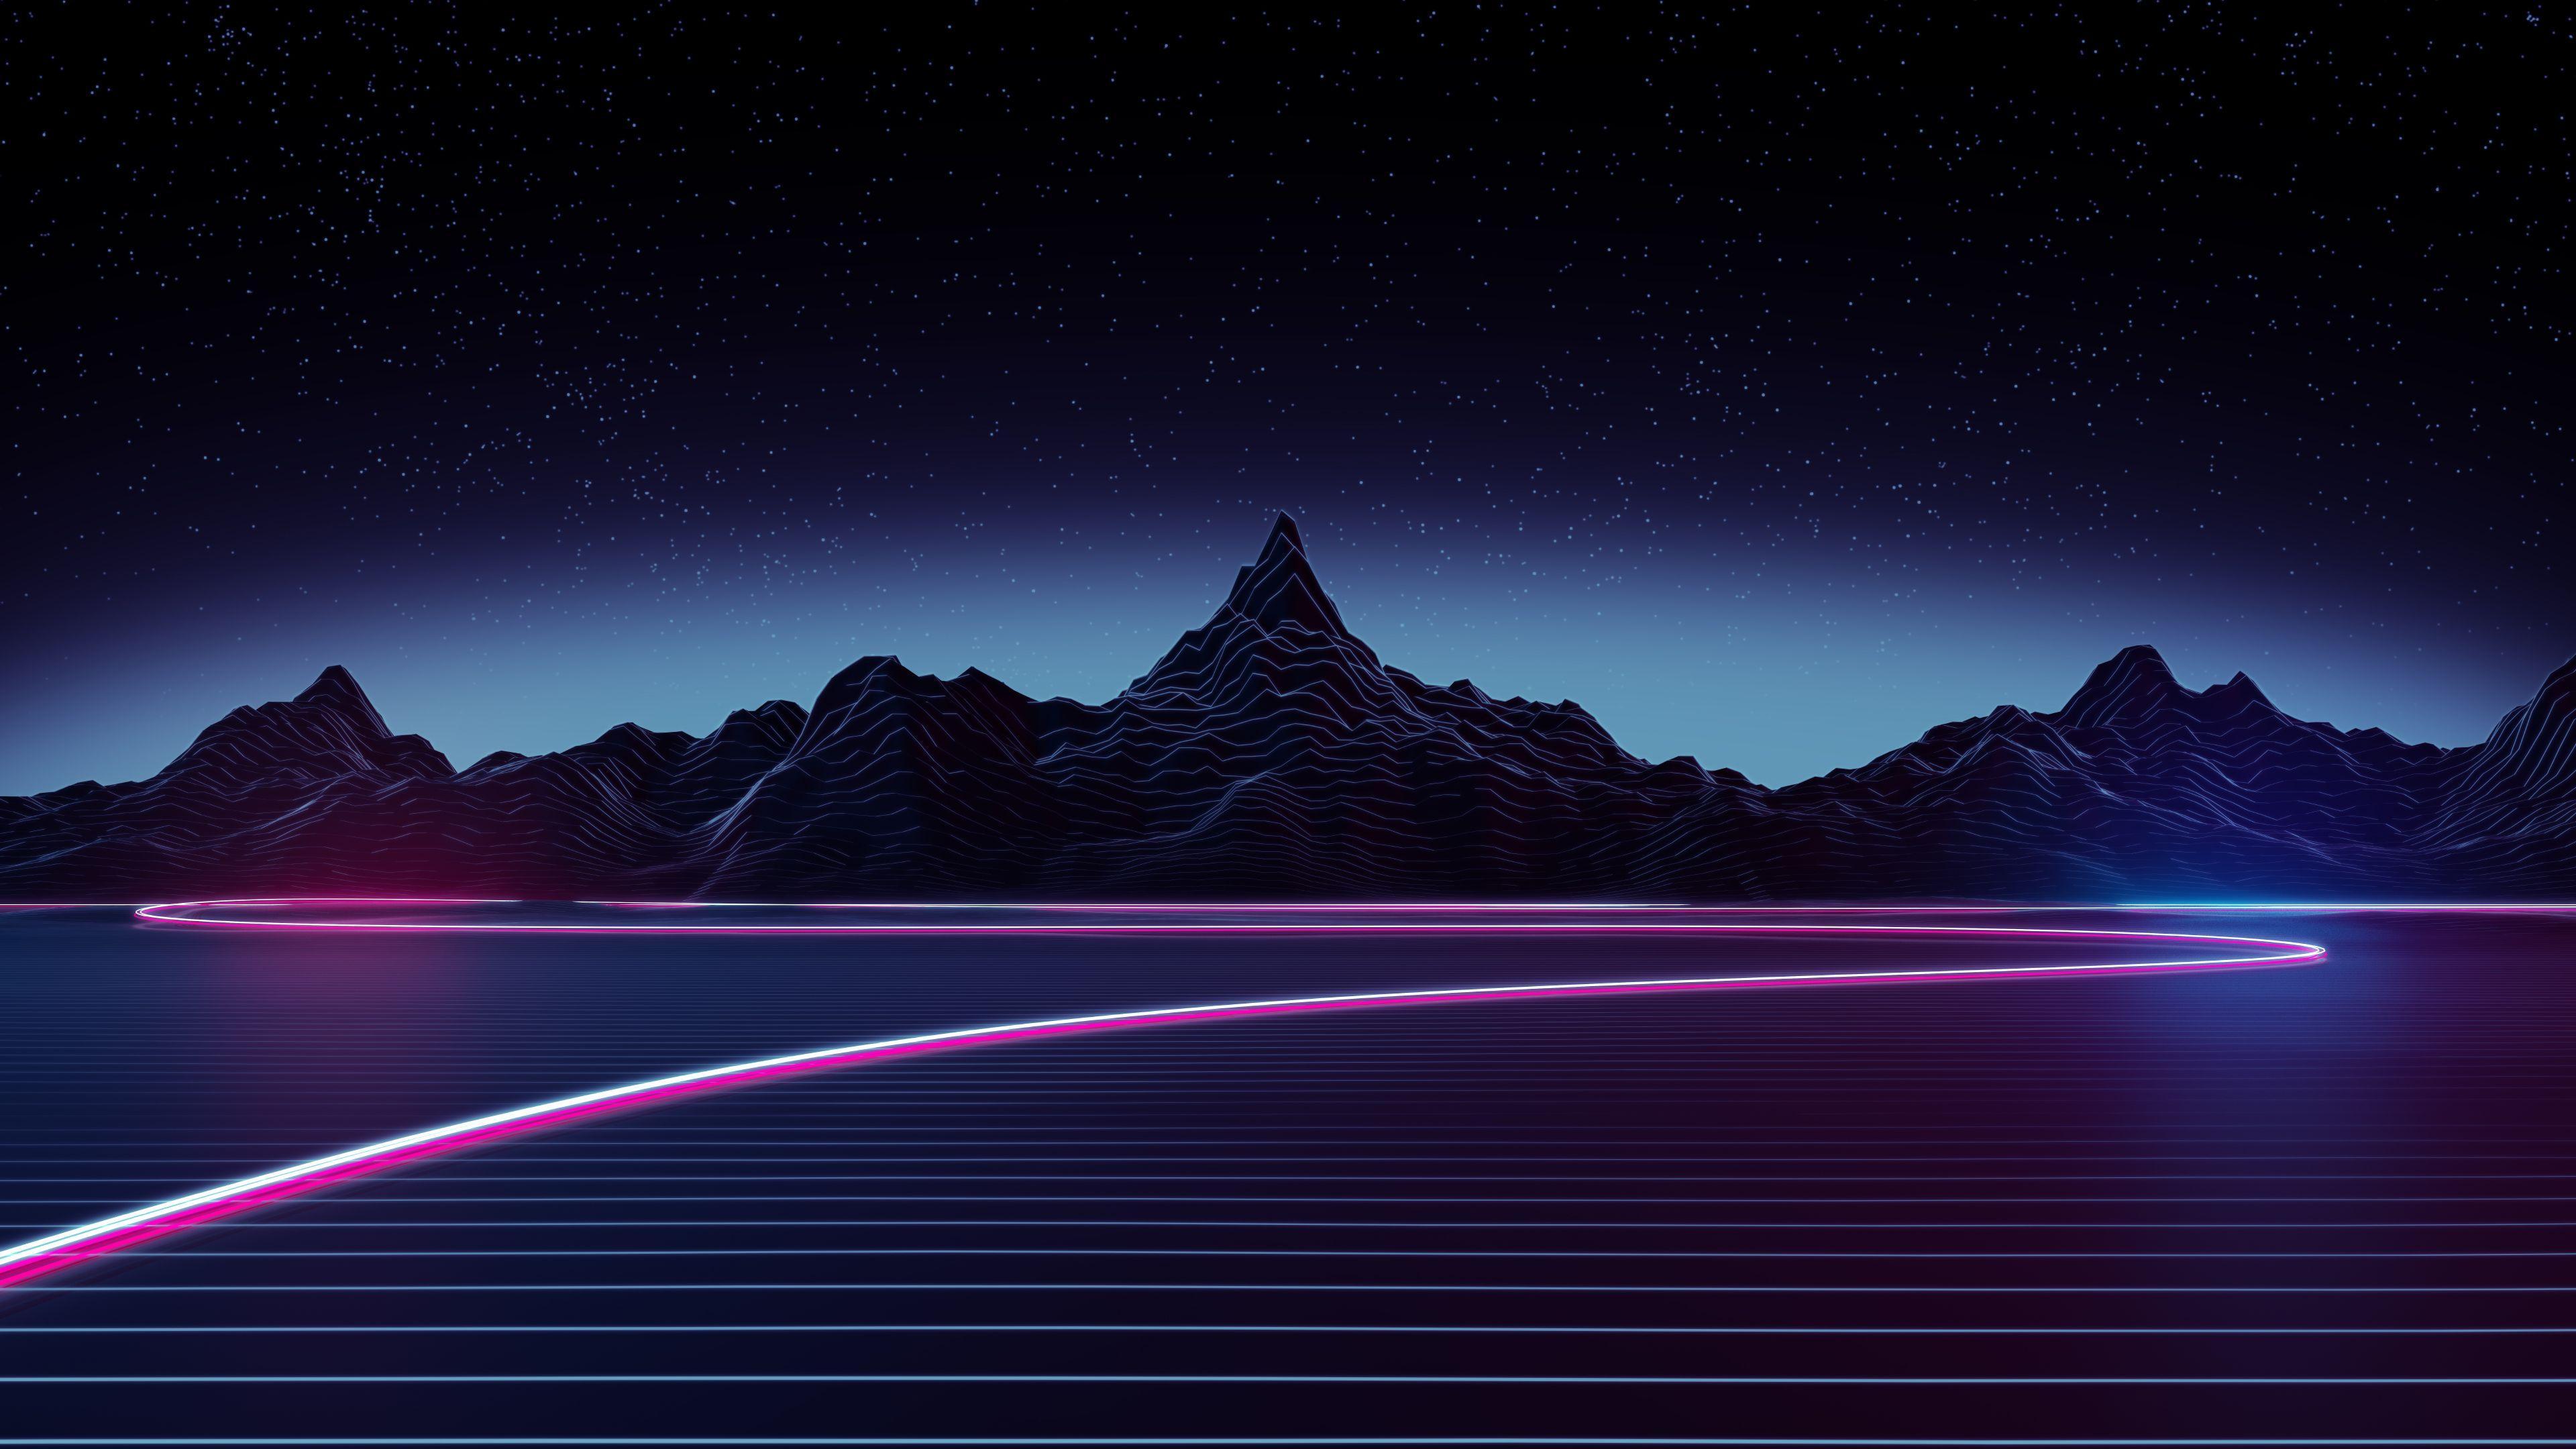 4k Neon Wallpapers Top Free 4k Neon Backgrounds Wallpaperaccess